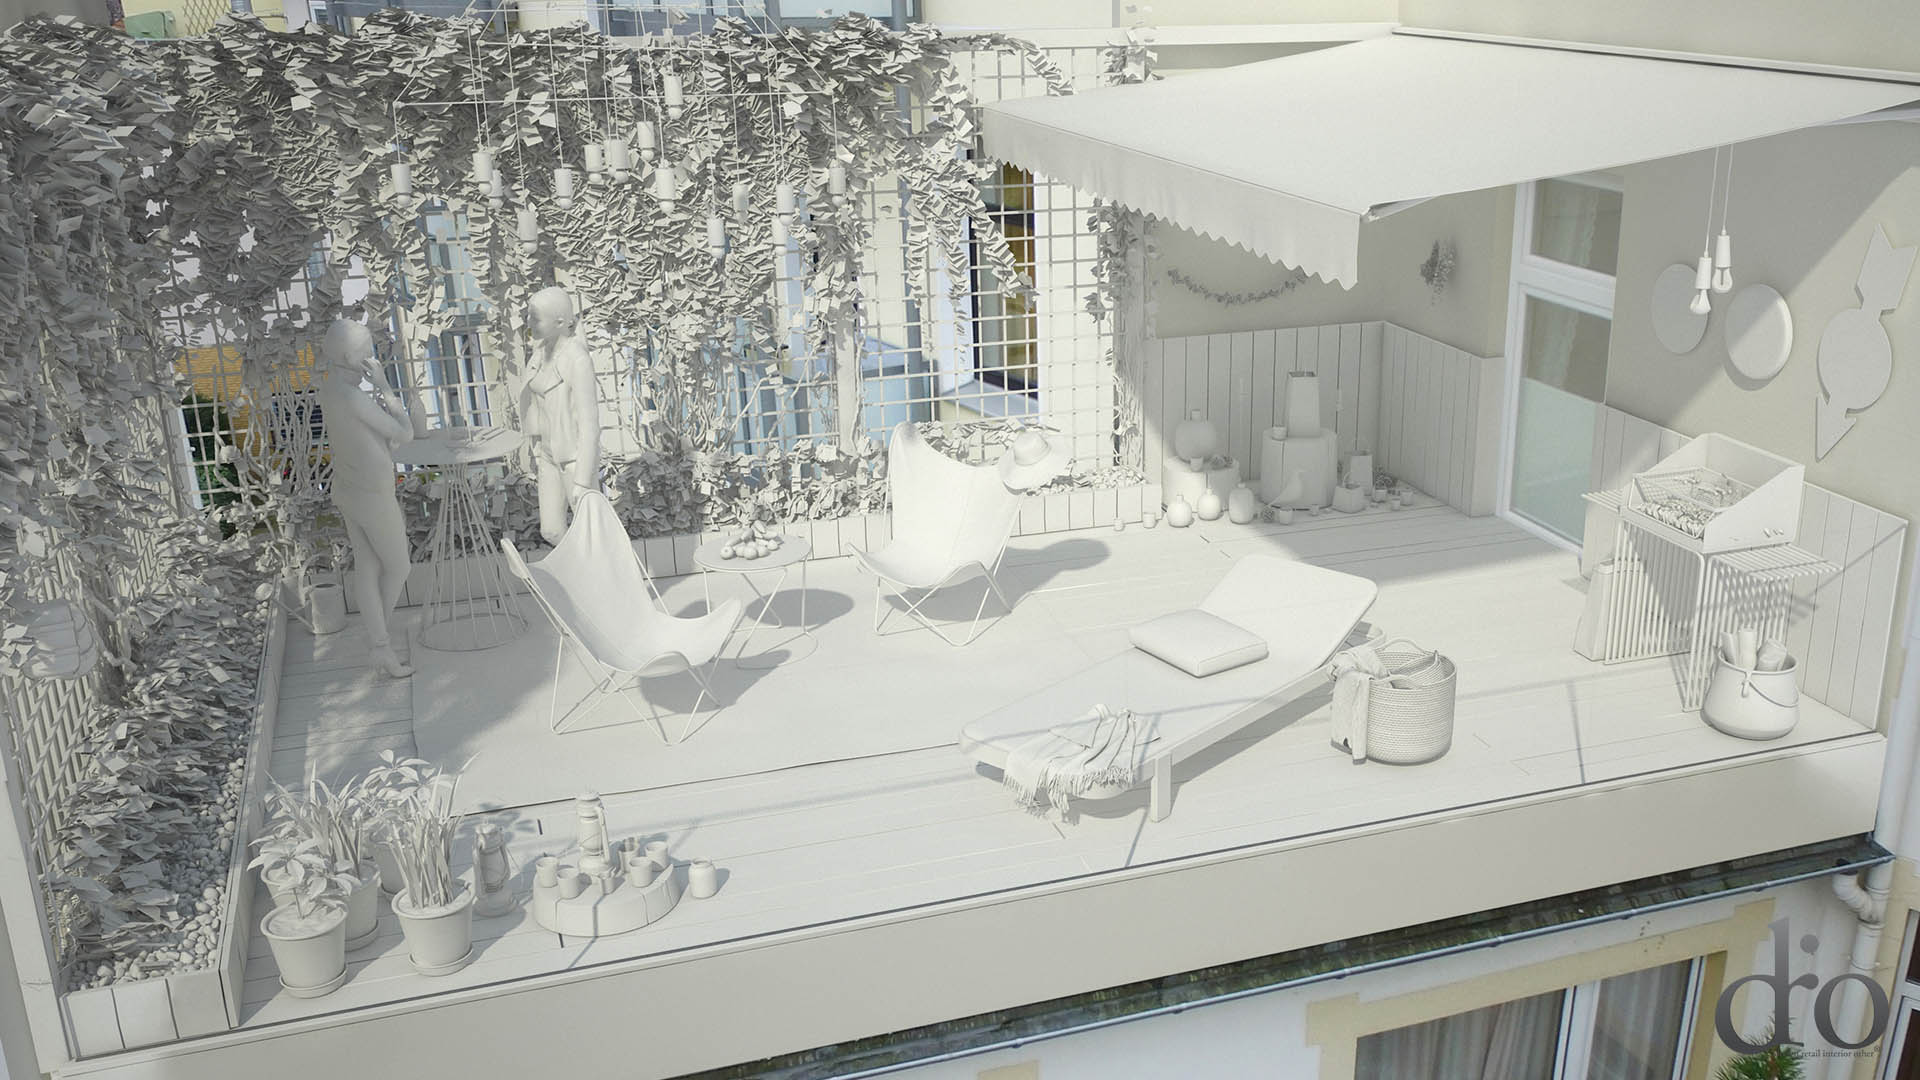 Architectural cgi innenarchitekt hannover for Innenarchitektur hannover